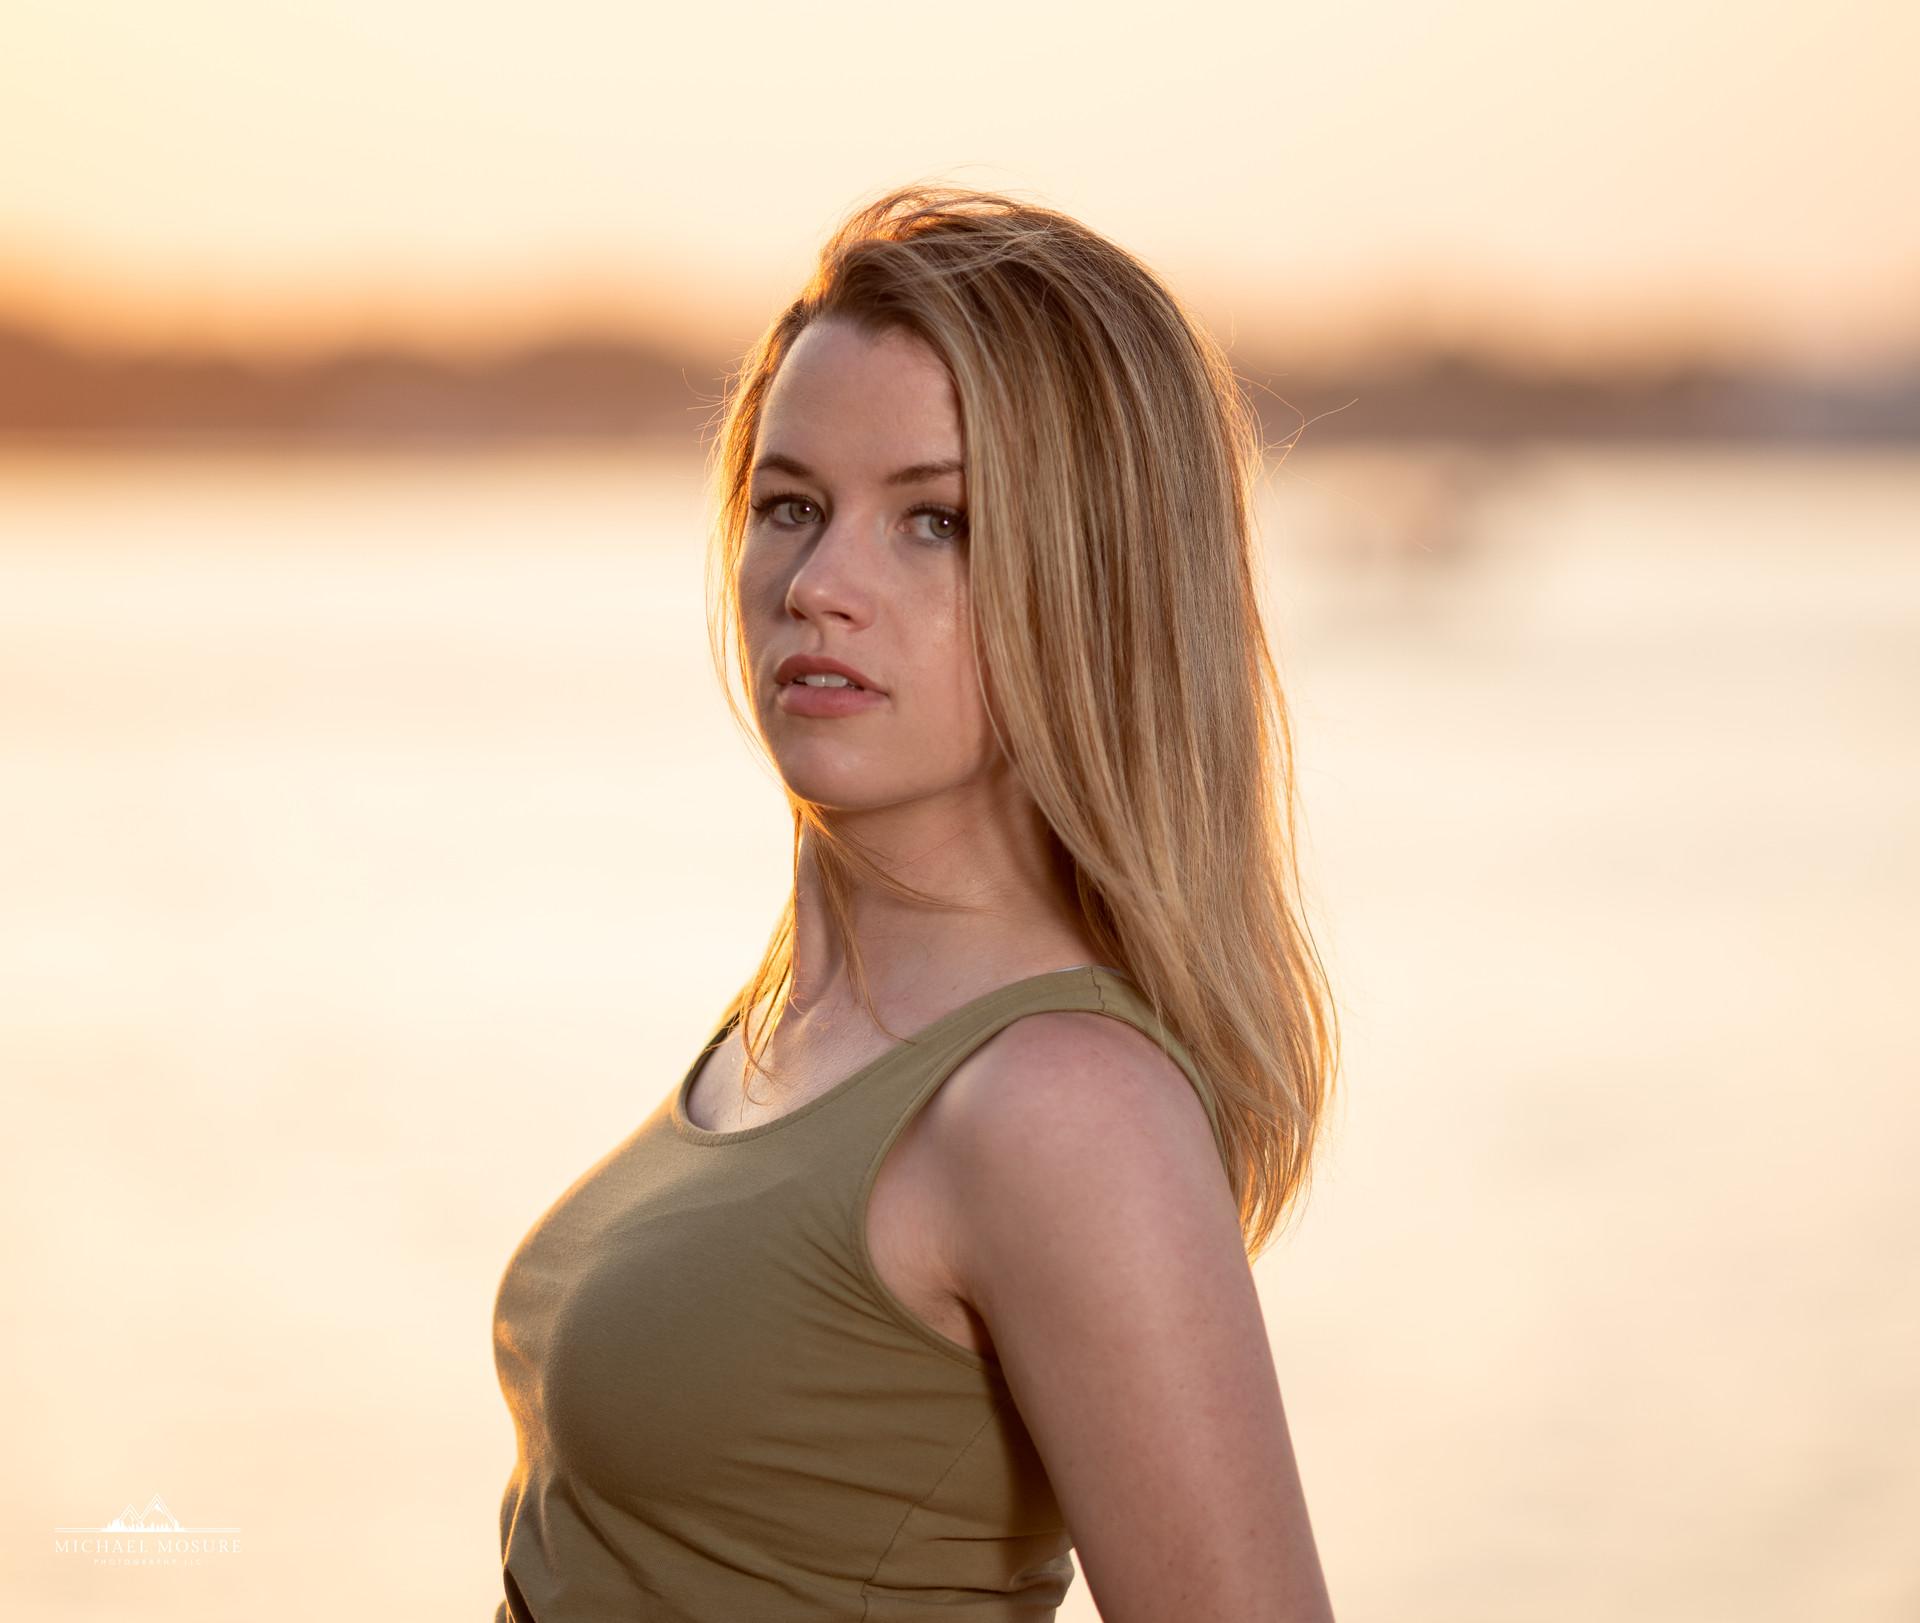 Coastal Sunset Portrait